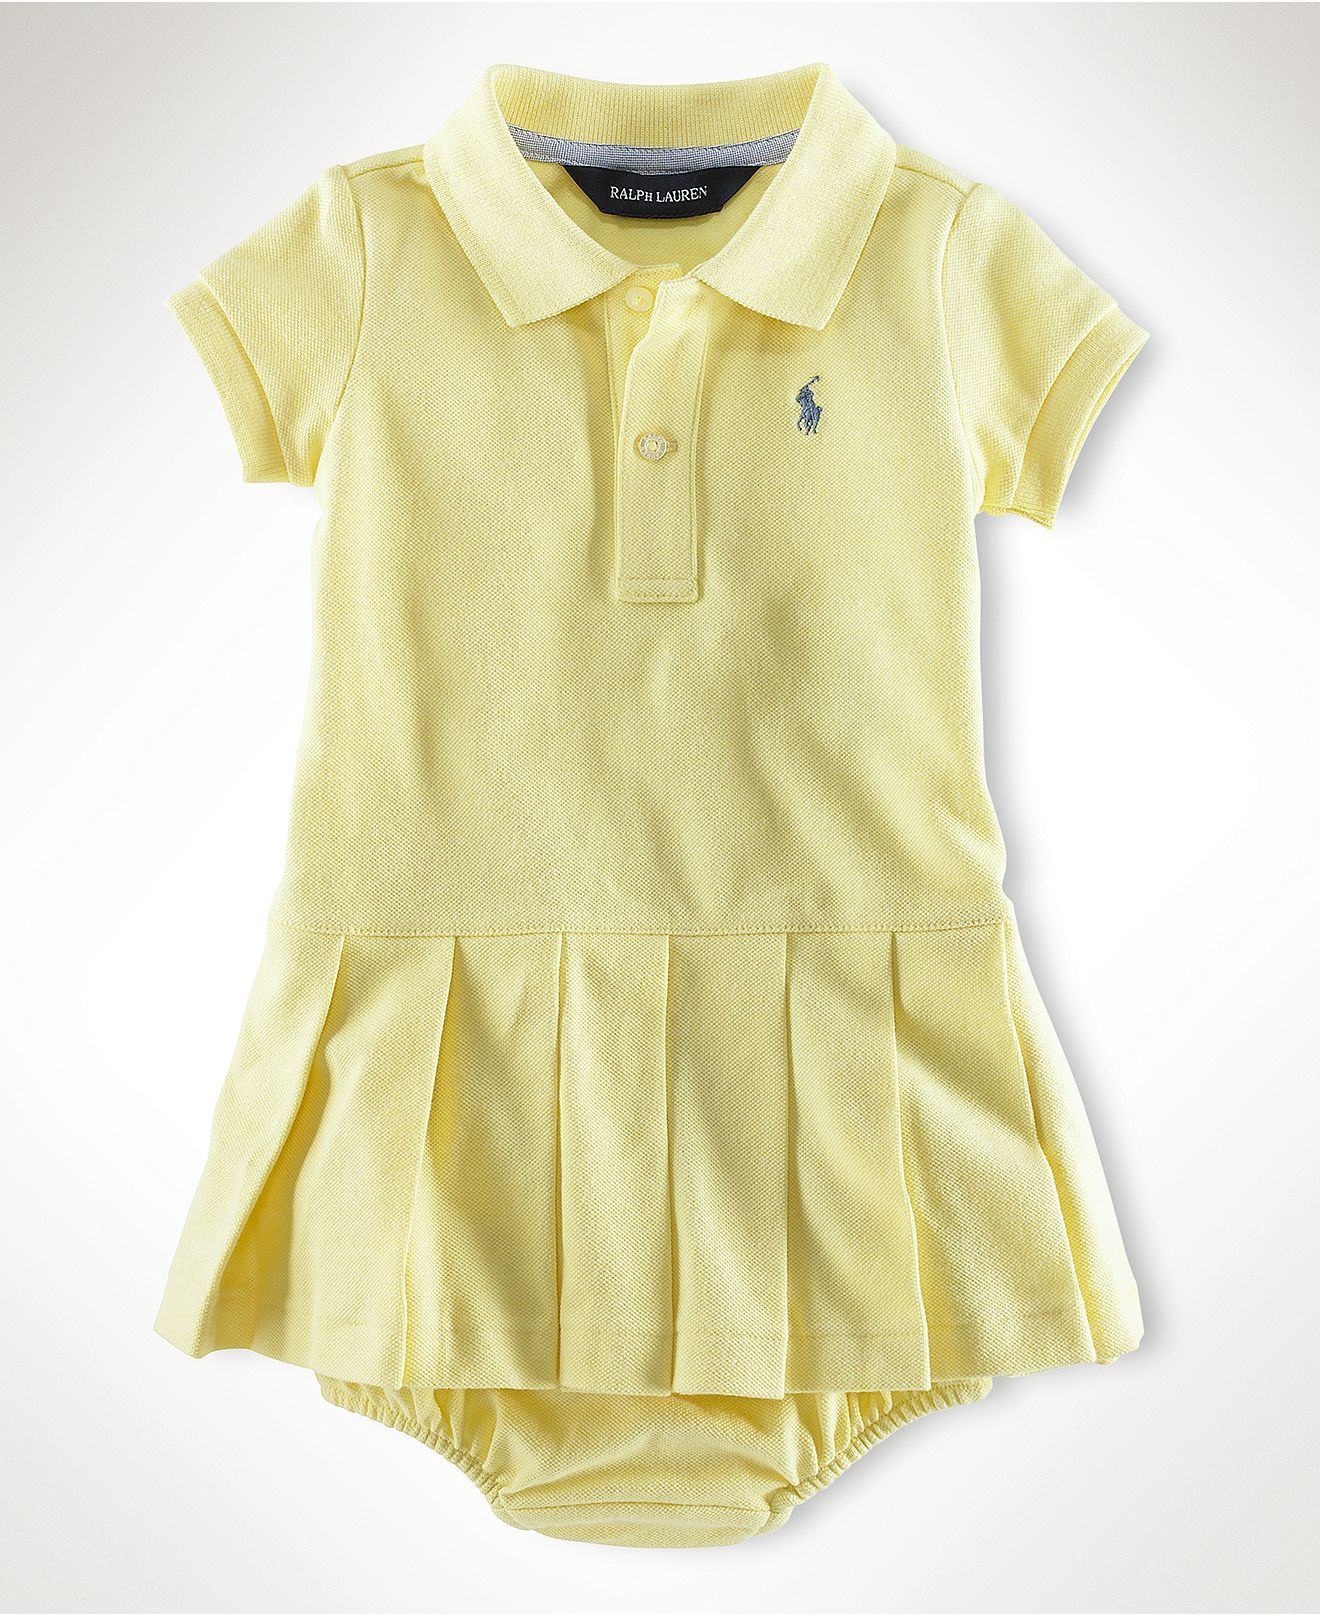 My children will wear all polo